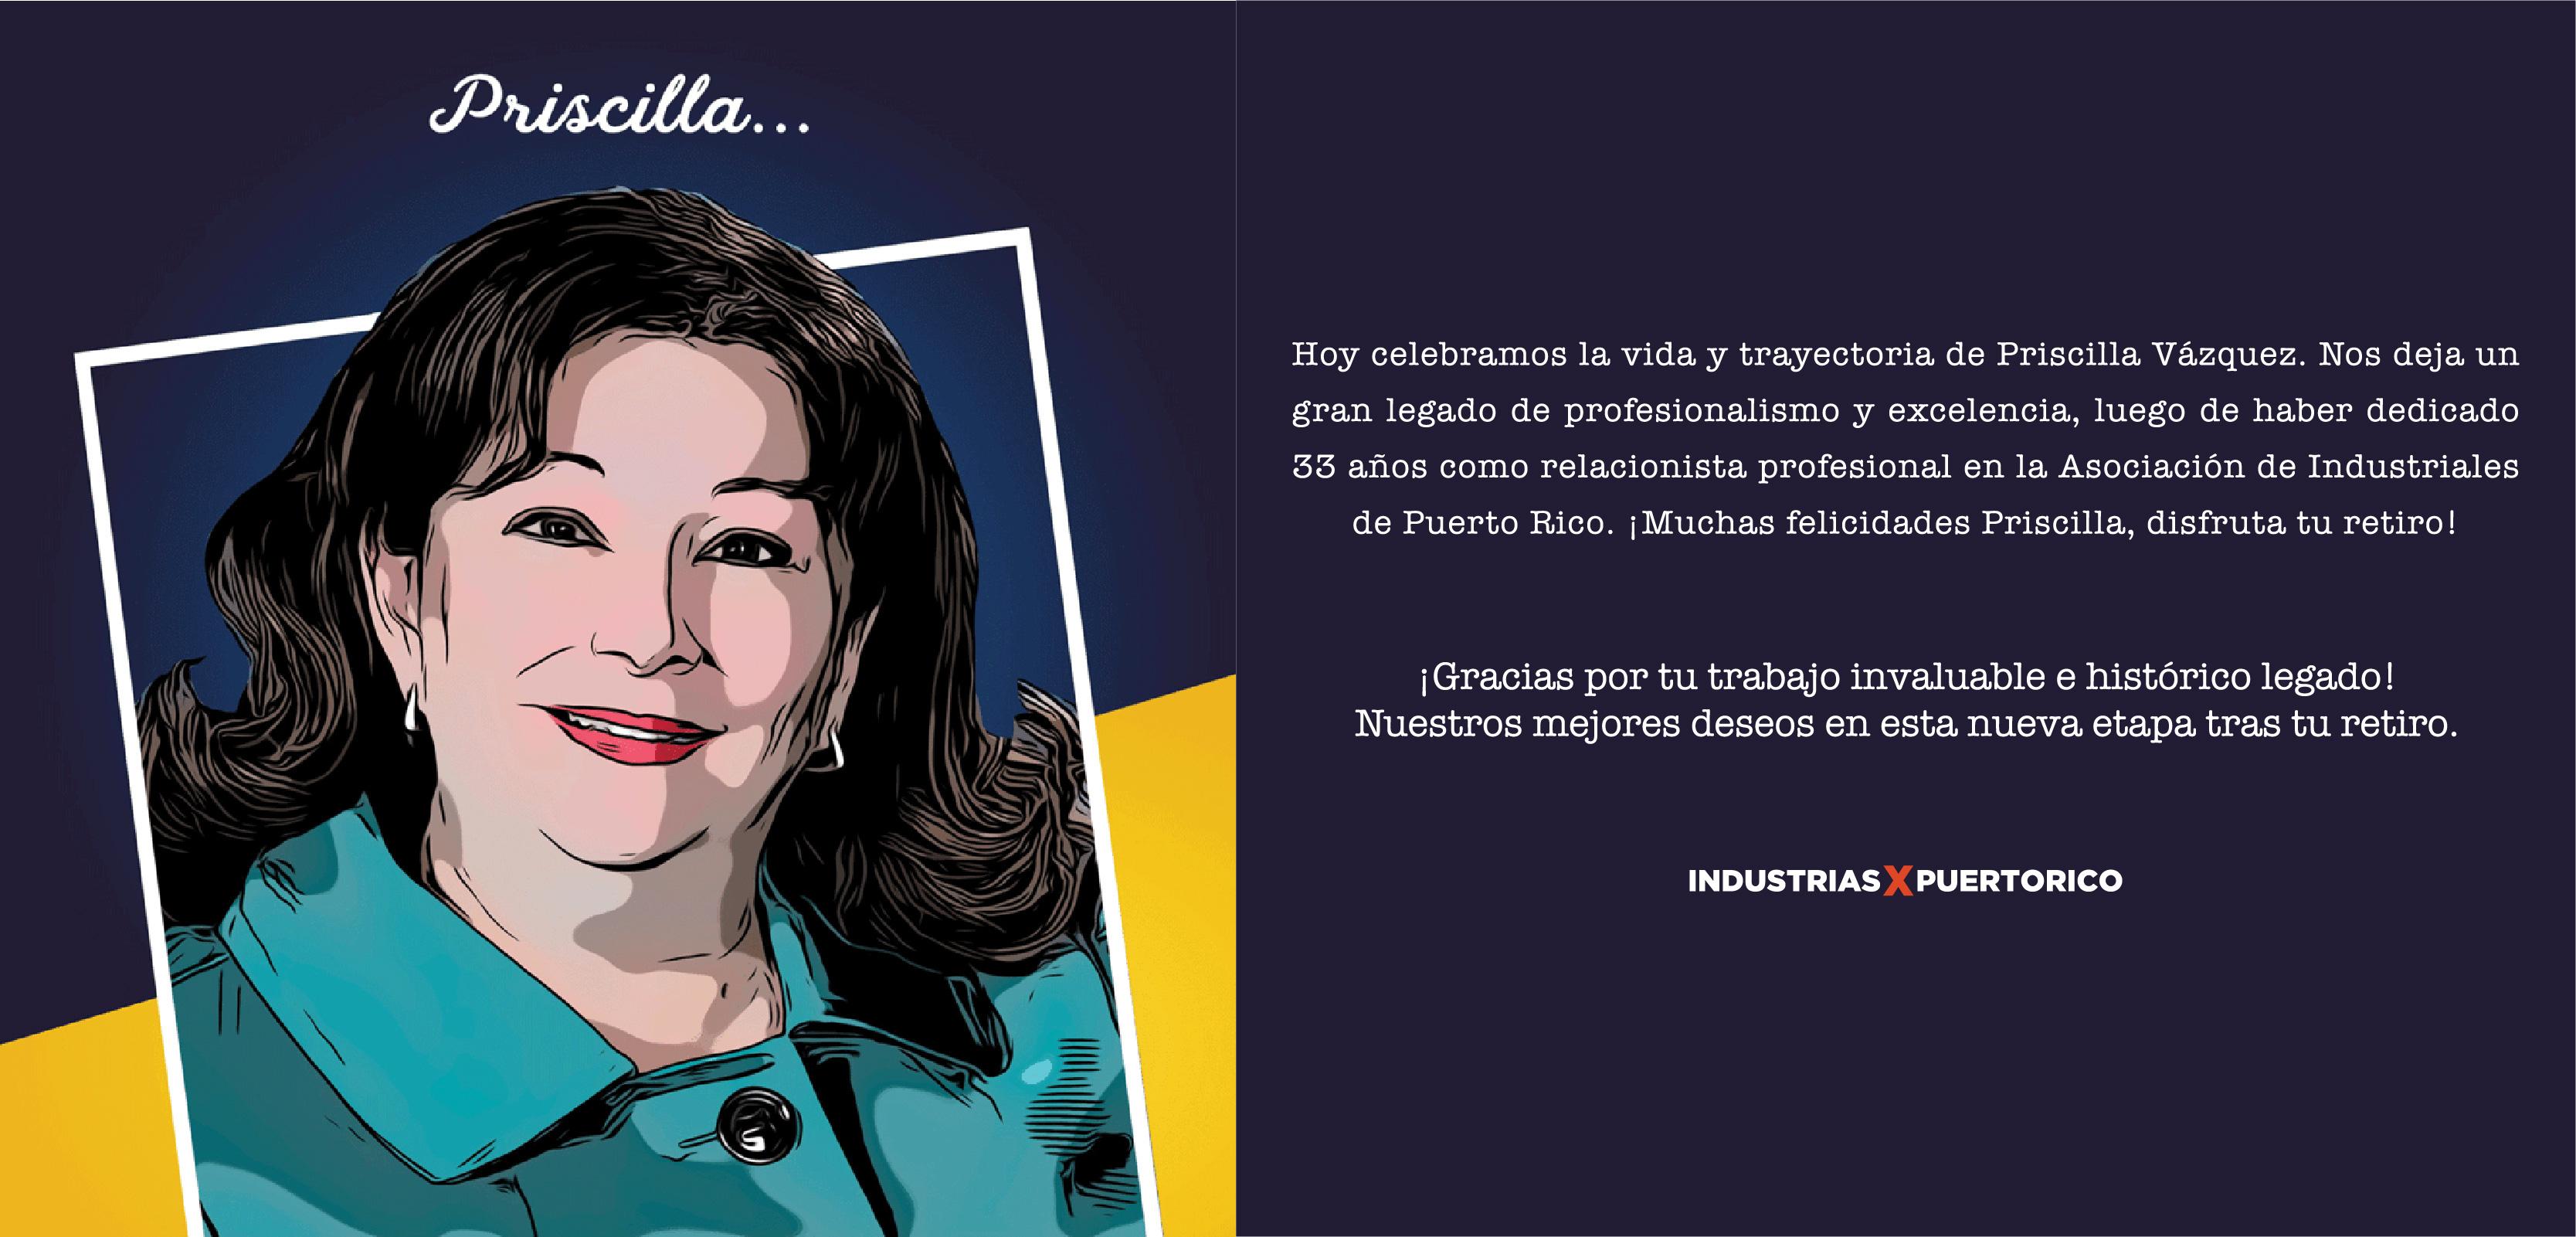 Priscilla Vázquez